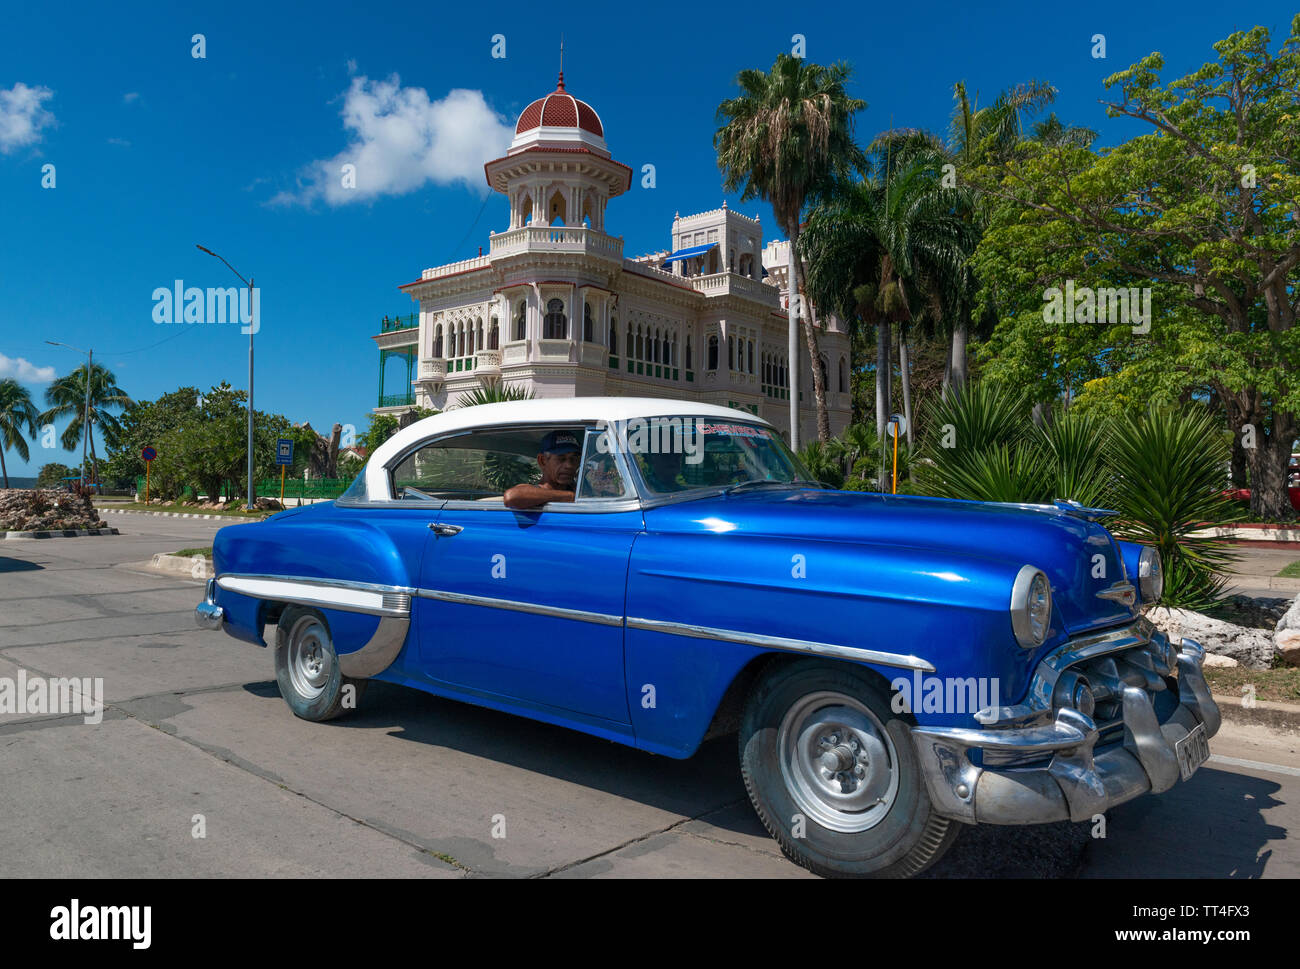 1950 American voiture conduit au-delà du Palacio de Valle, maintenant un restaurant, sur la Punta Gorda, Cienfuegos, Cuba Banque D'Images